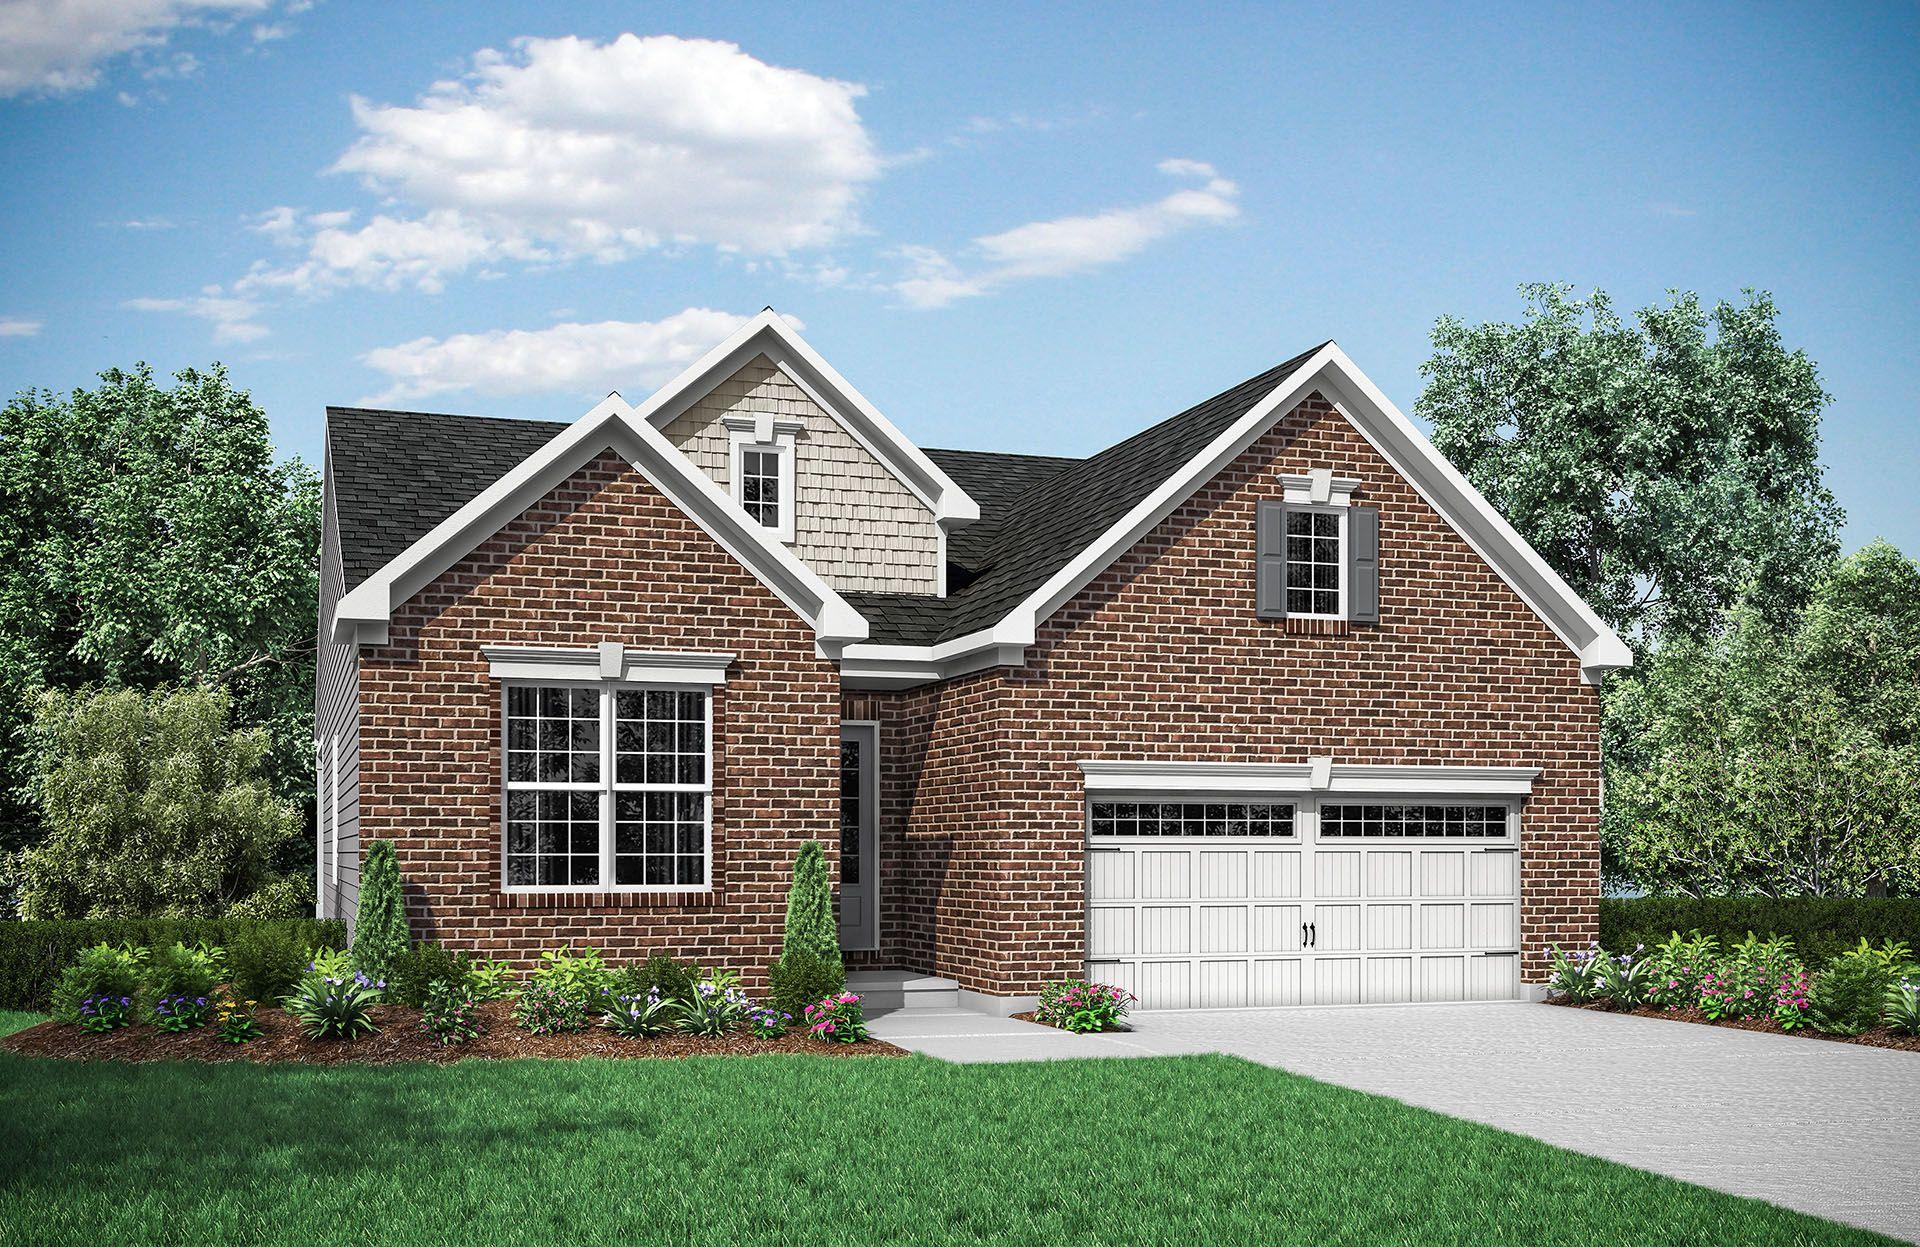 Real Estate at Limerick Circle, Independence in Kenton County, KY 41051